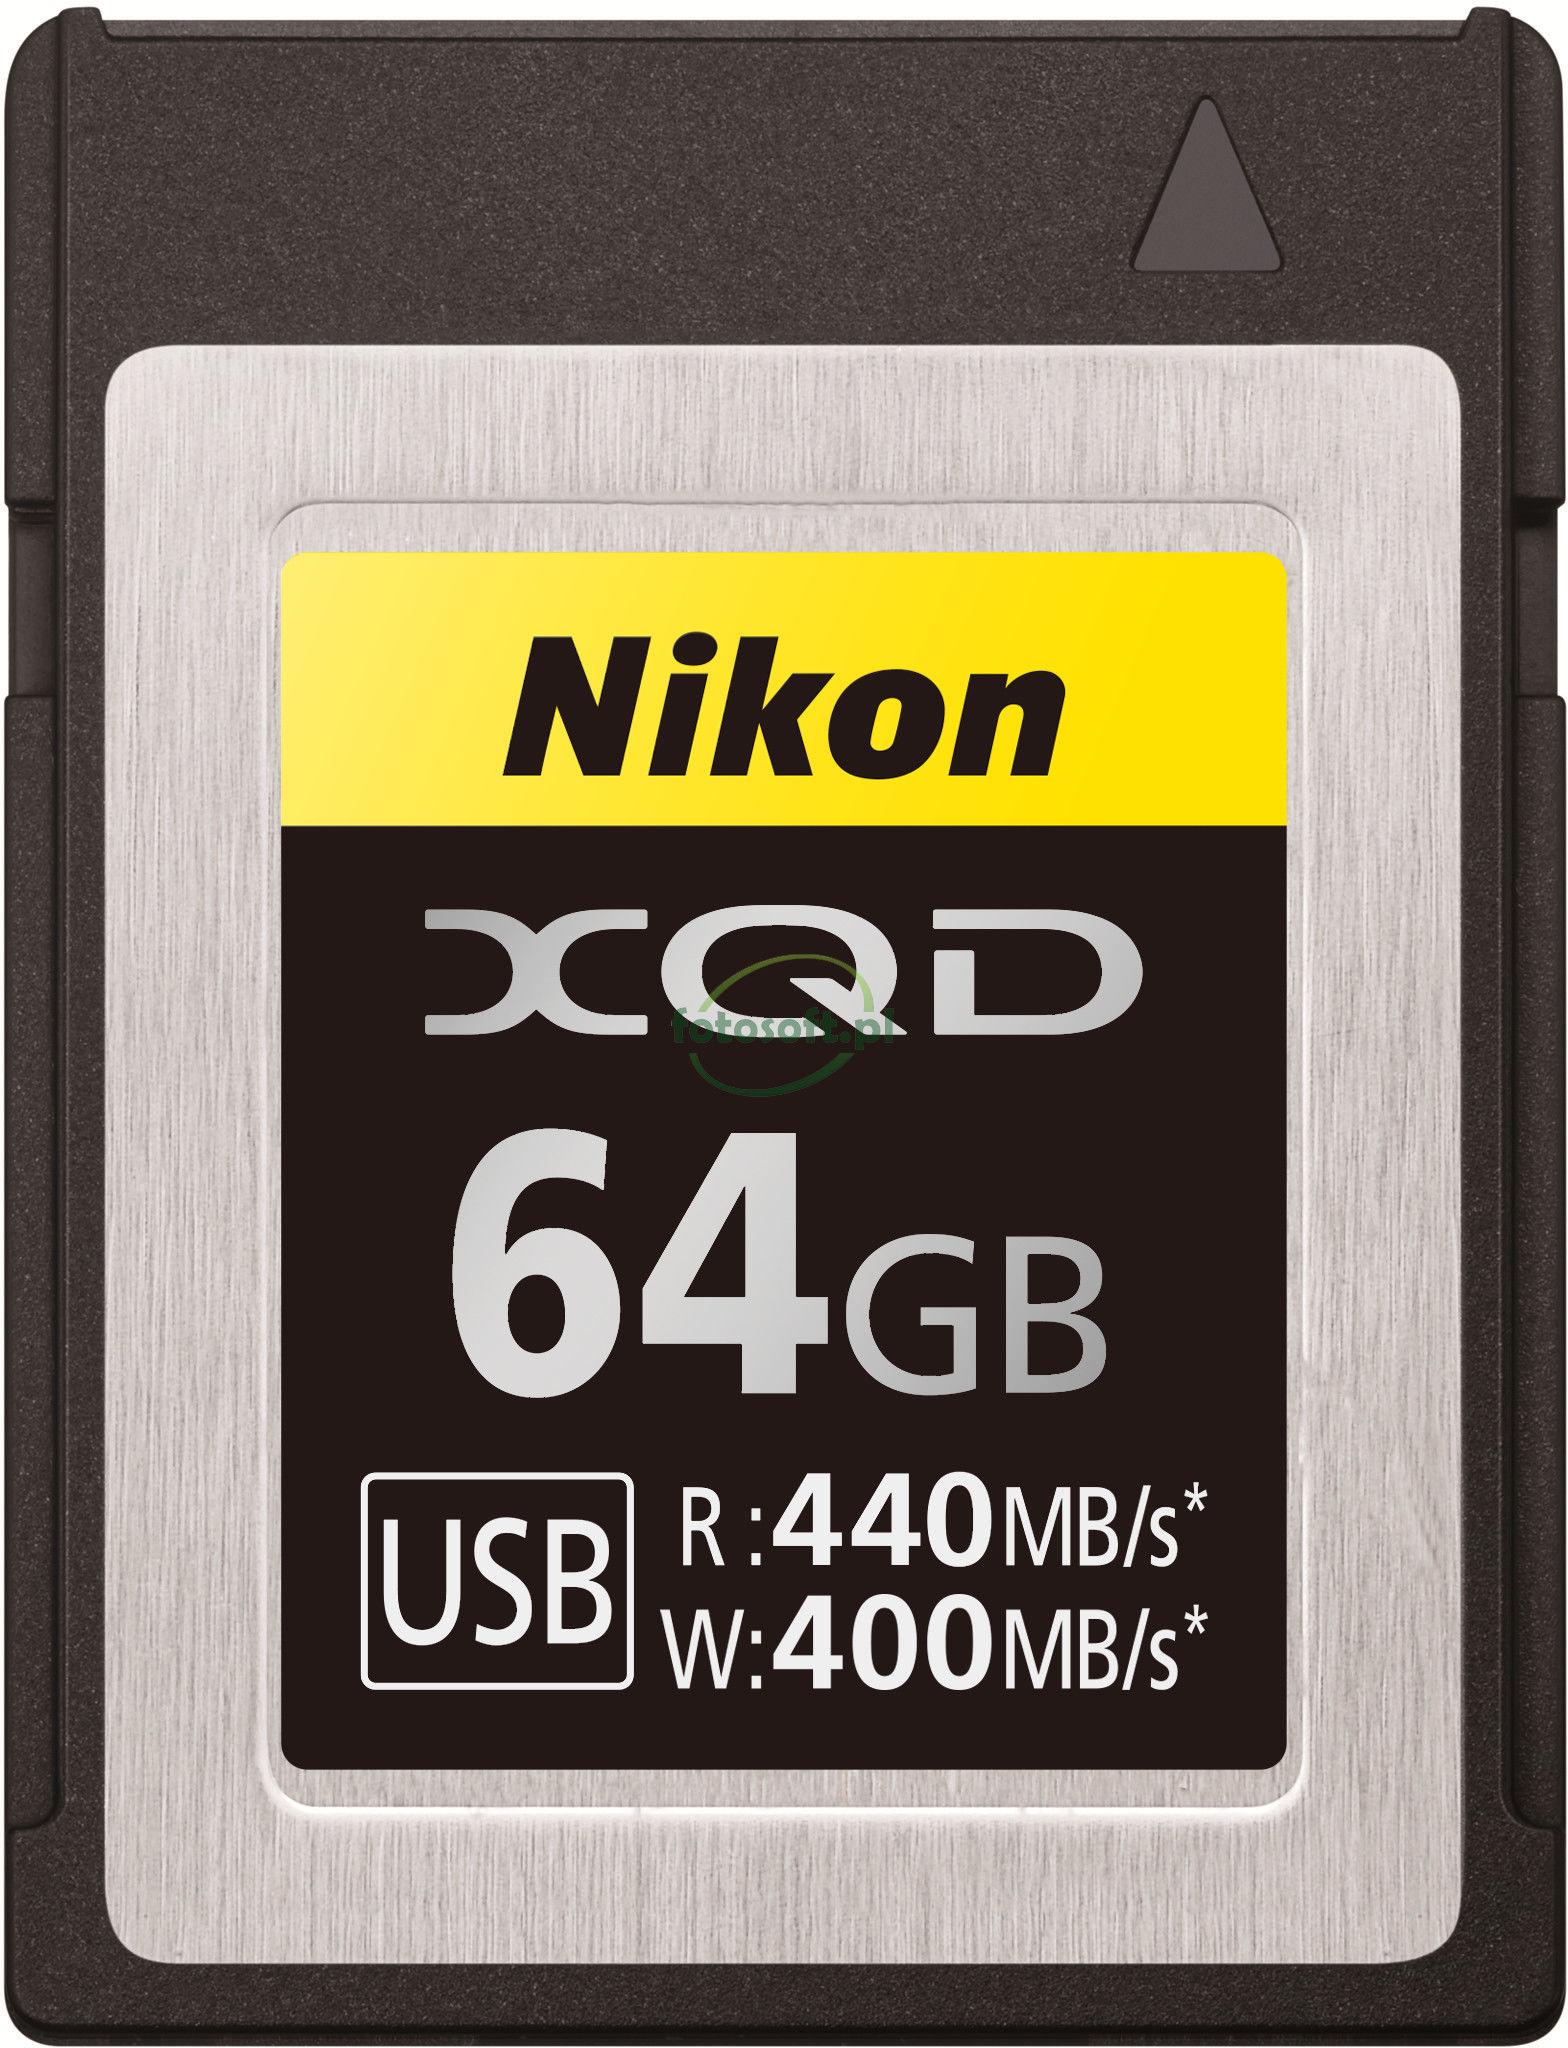 KARTA PAMIĘCI NIKON XQD 64GB 440MB/s / WYSYŁKA GRATIS / RATY 0% / TEL. 500 005 235